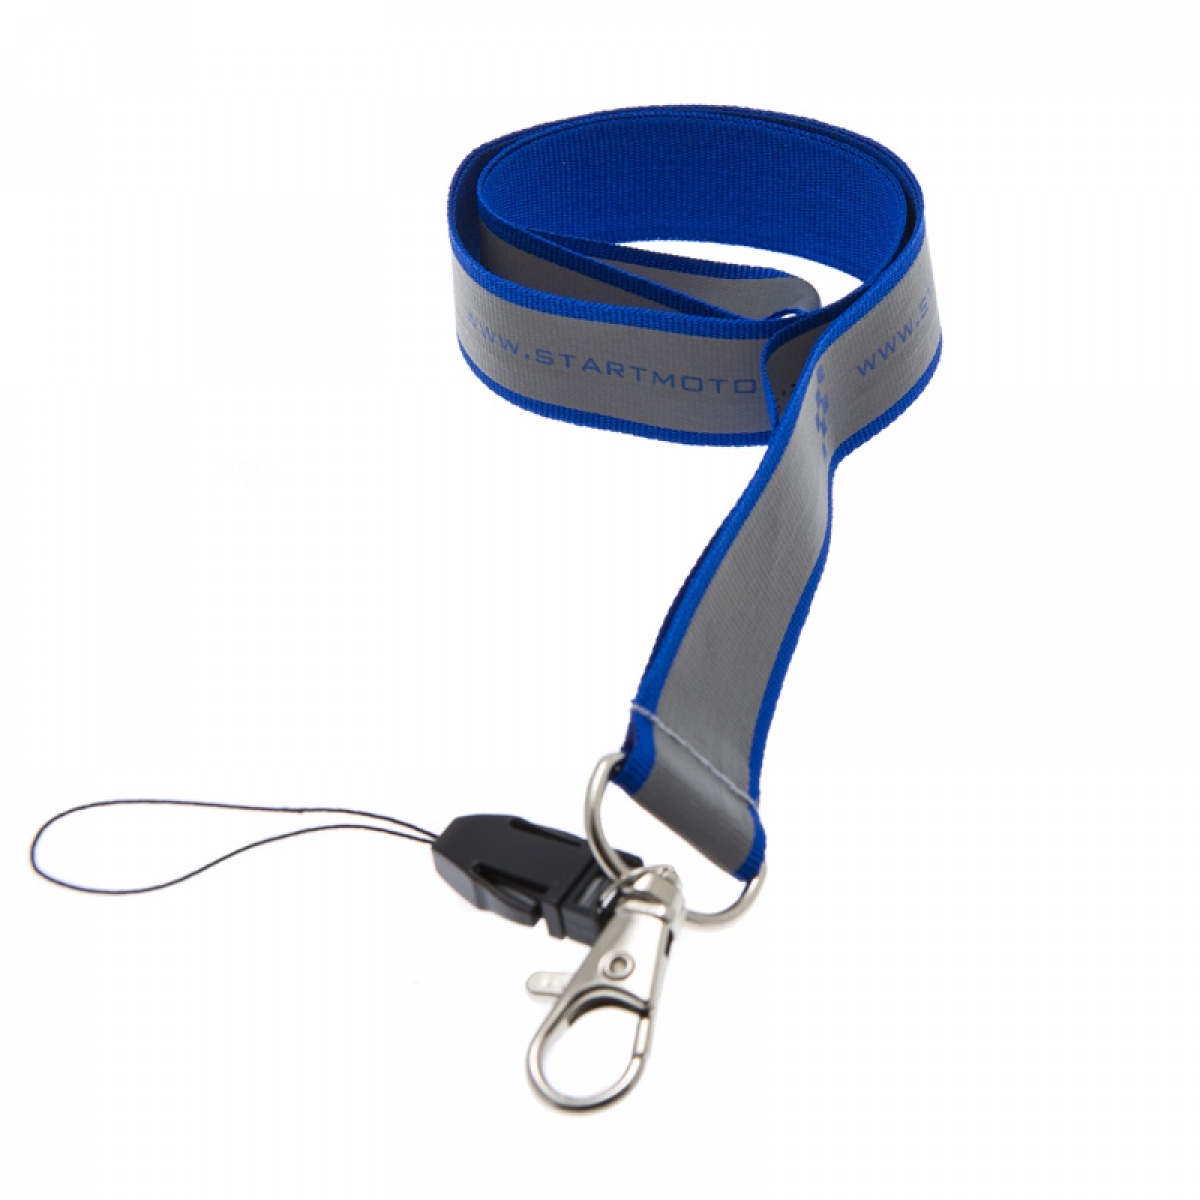 Nyckelband - Reflex